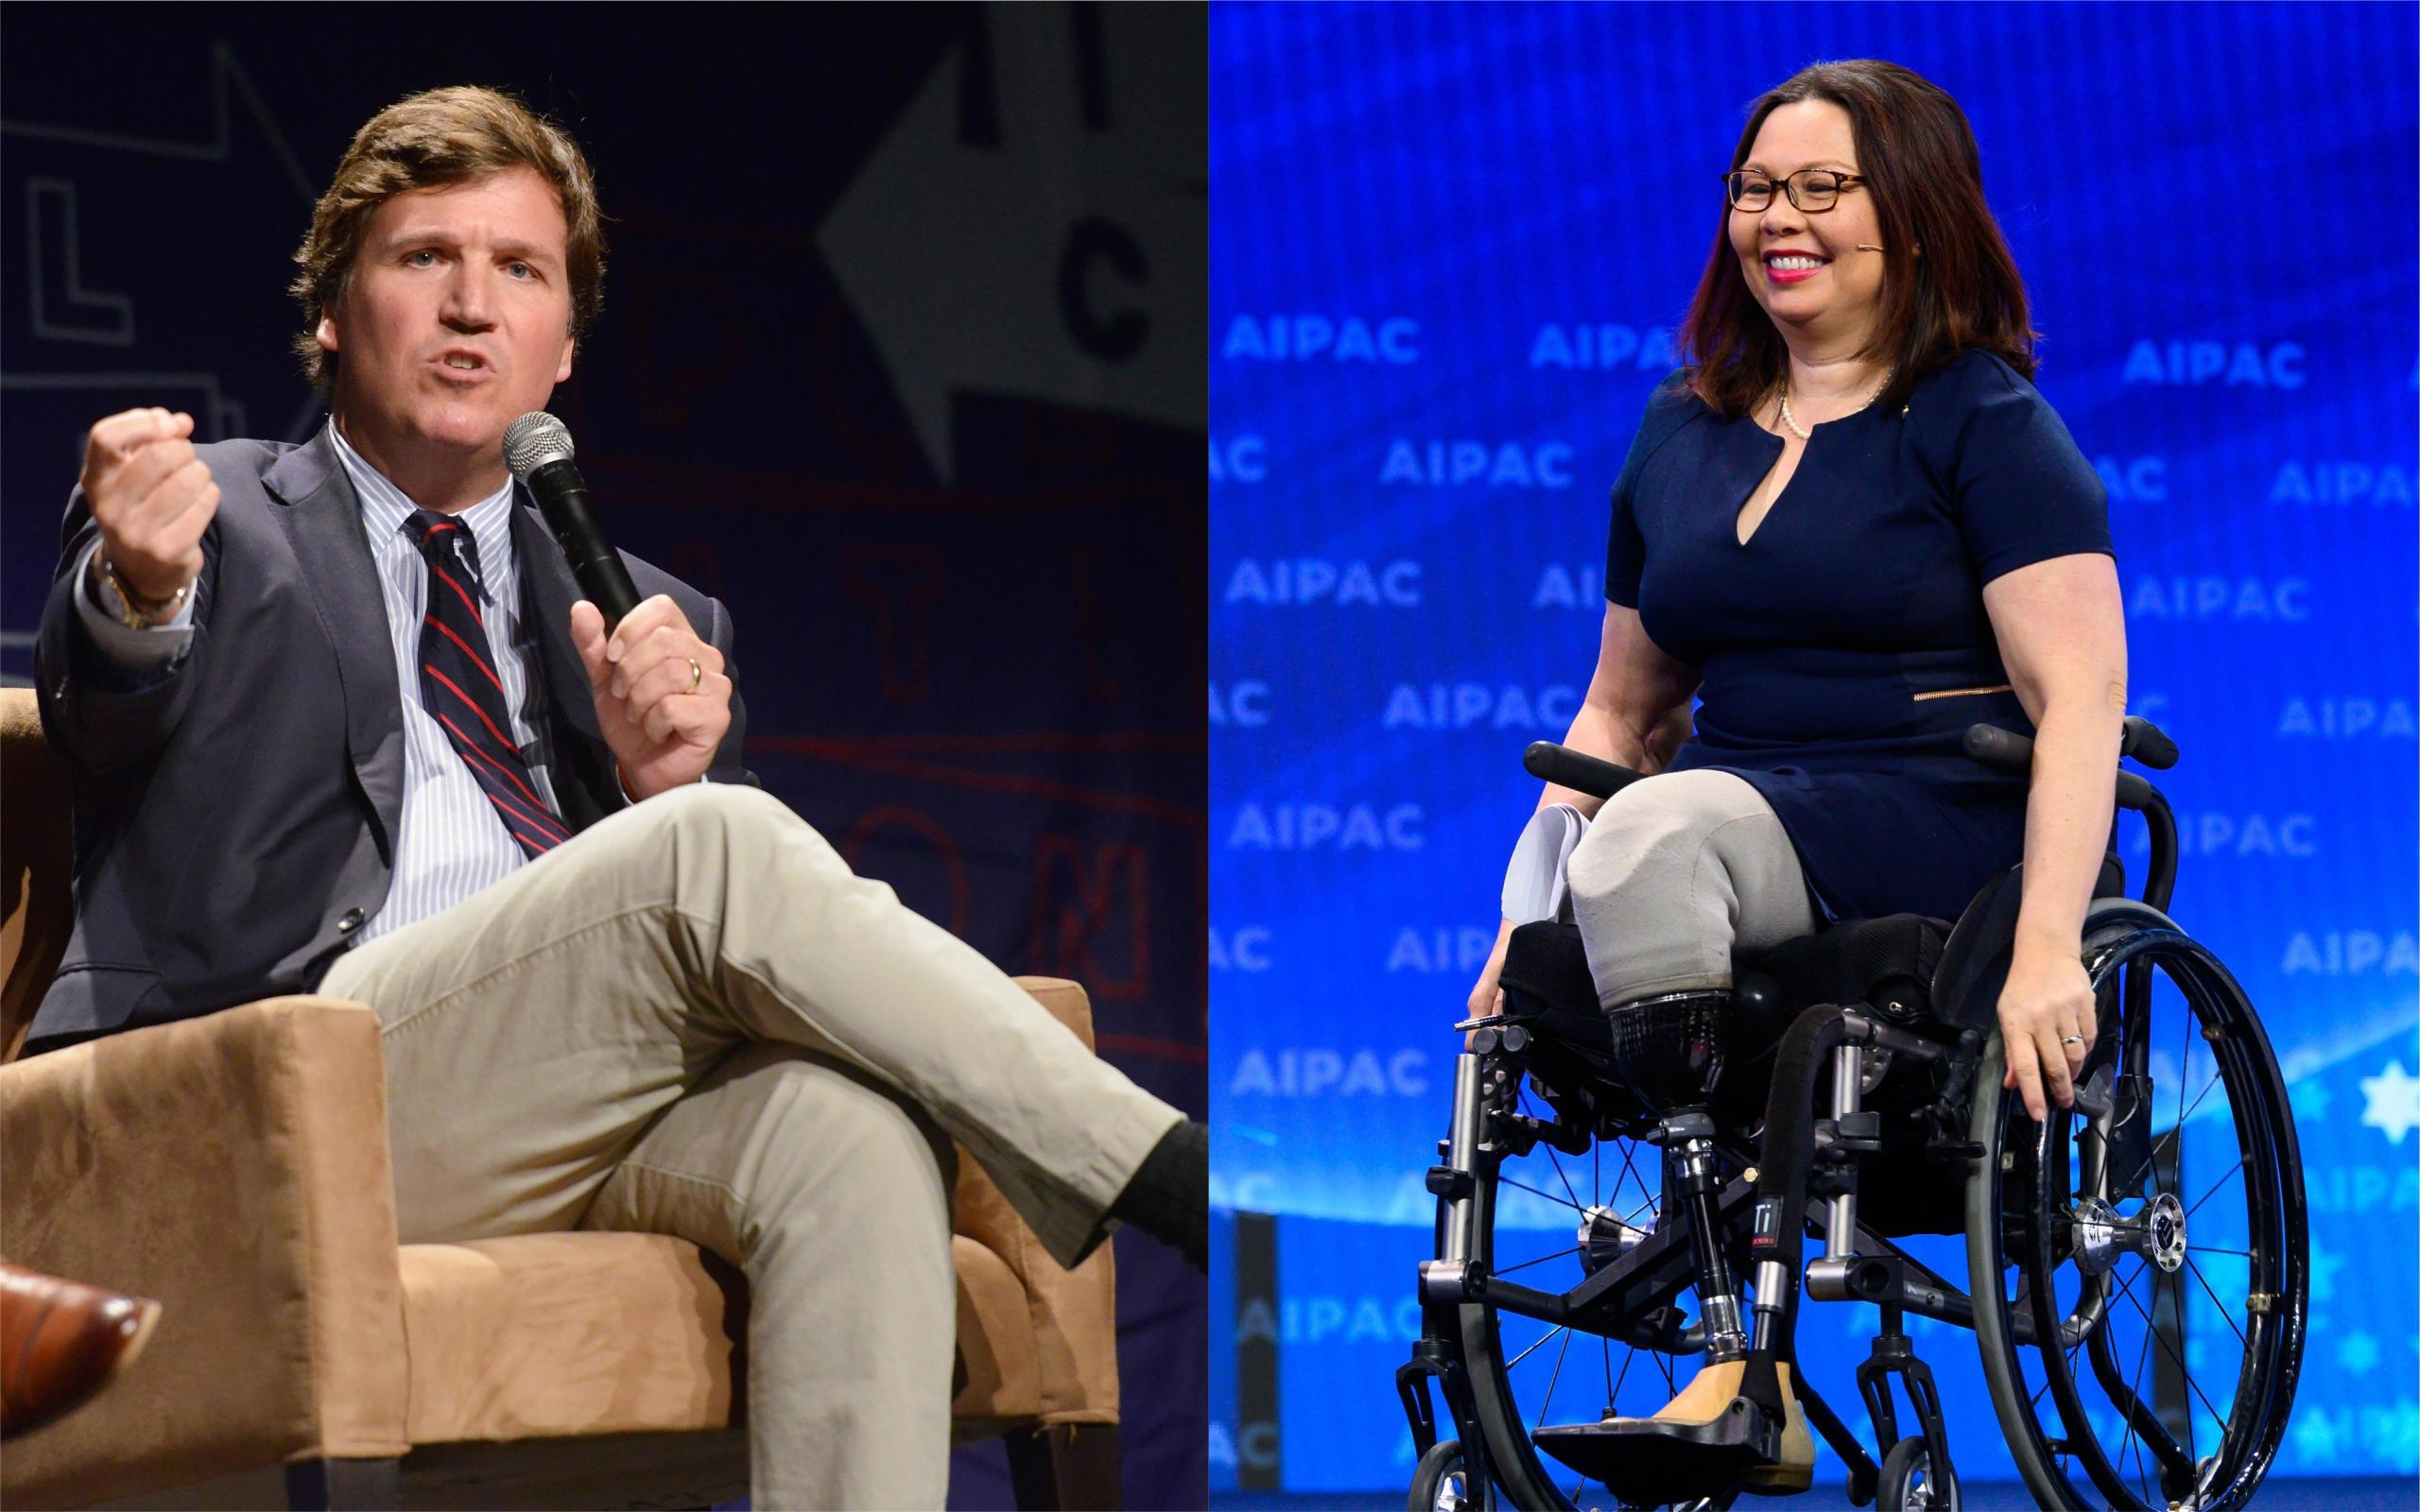 Sen. Tammy Duckworth responds after Tucker Carlson suggests she hates America